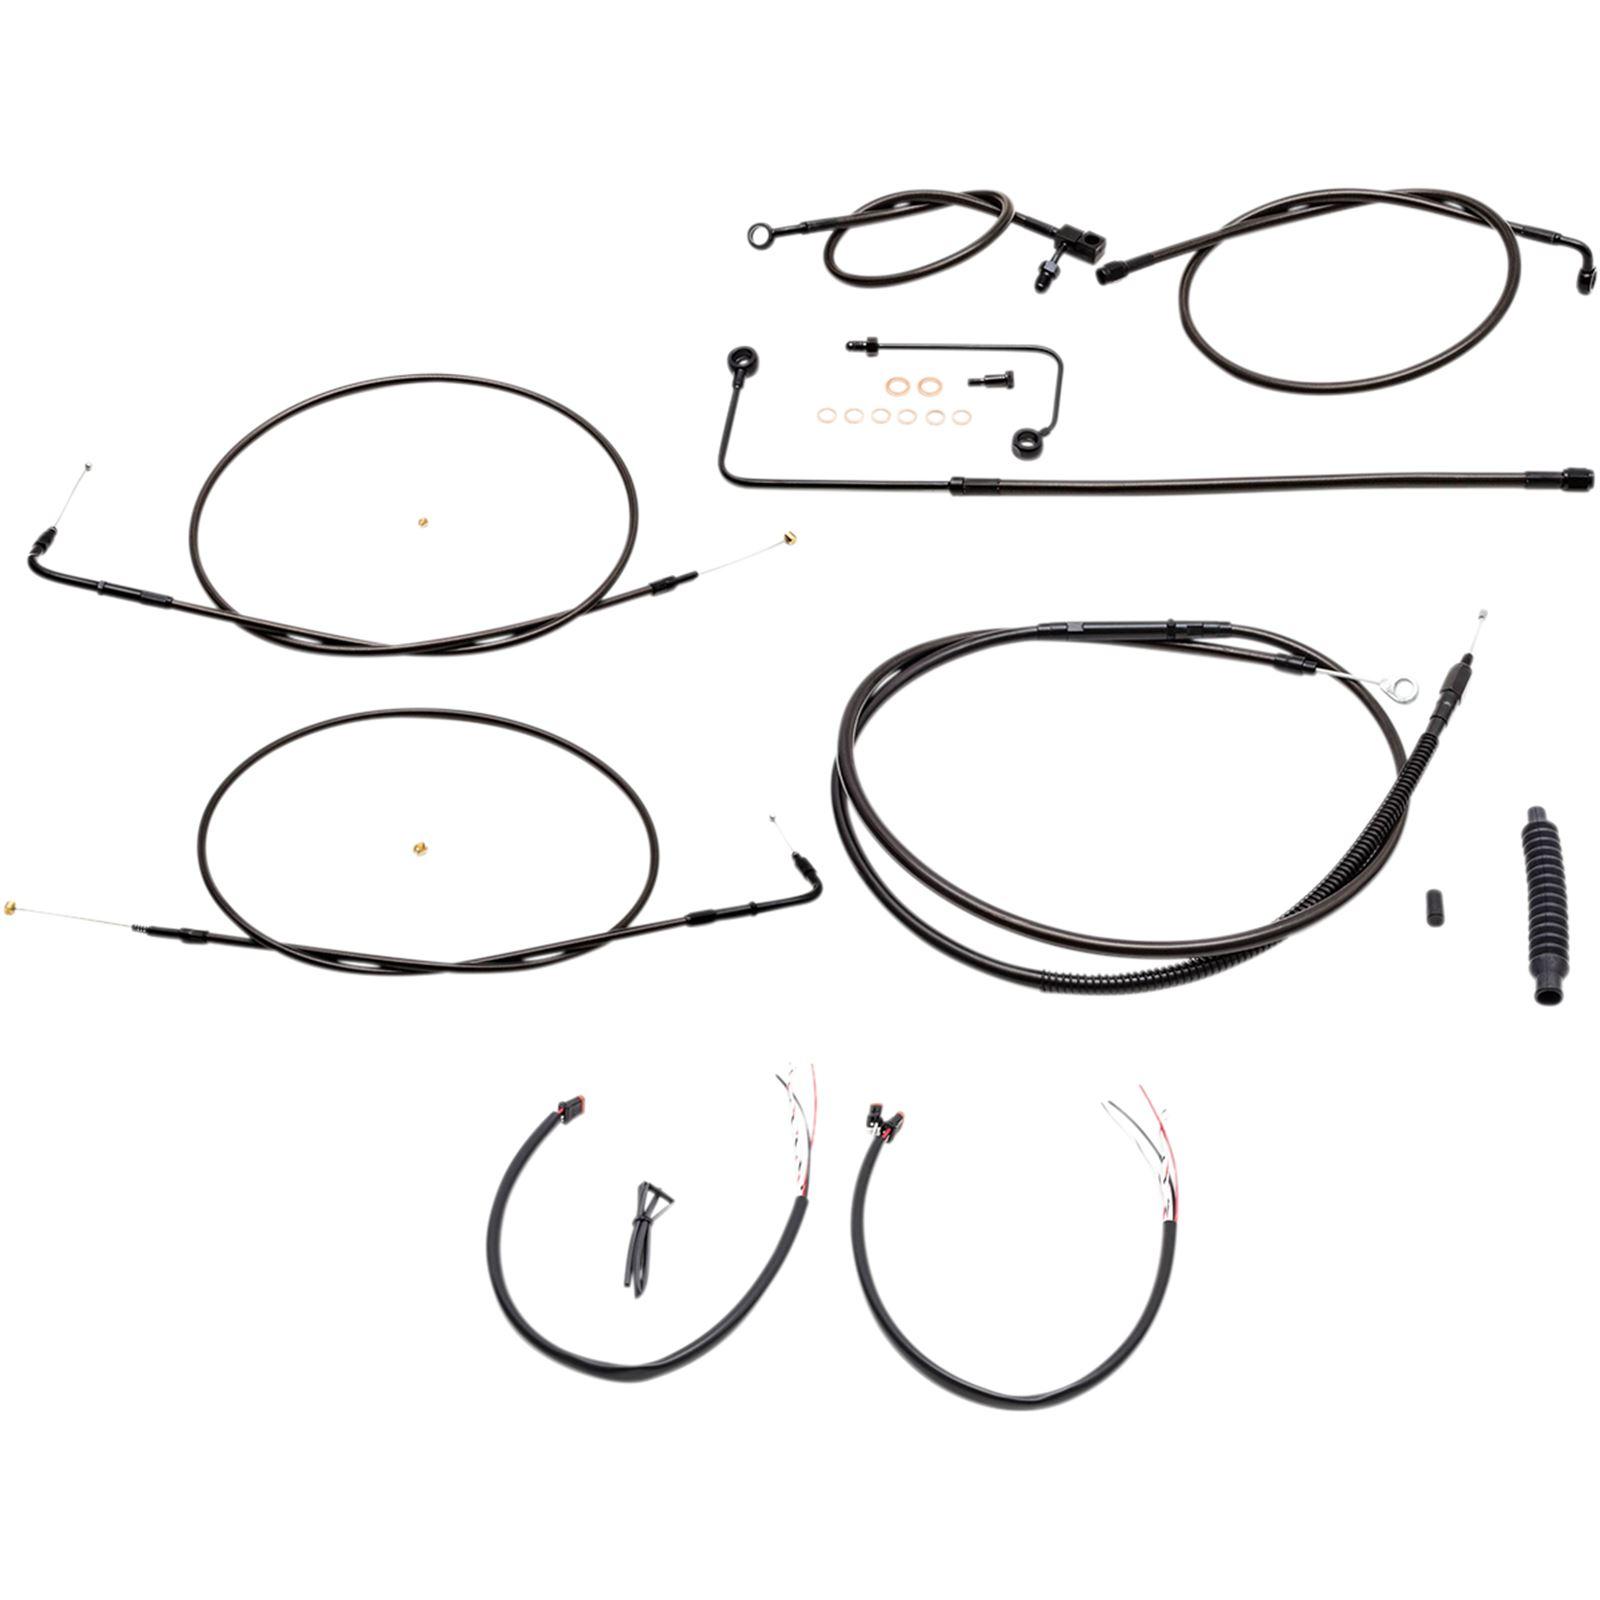 "LA Choppers Midnight Cable Kit for 12"" - 14"" Ape Hanger Handlebars"